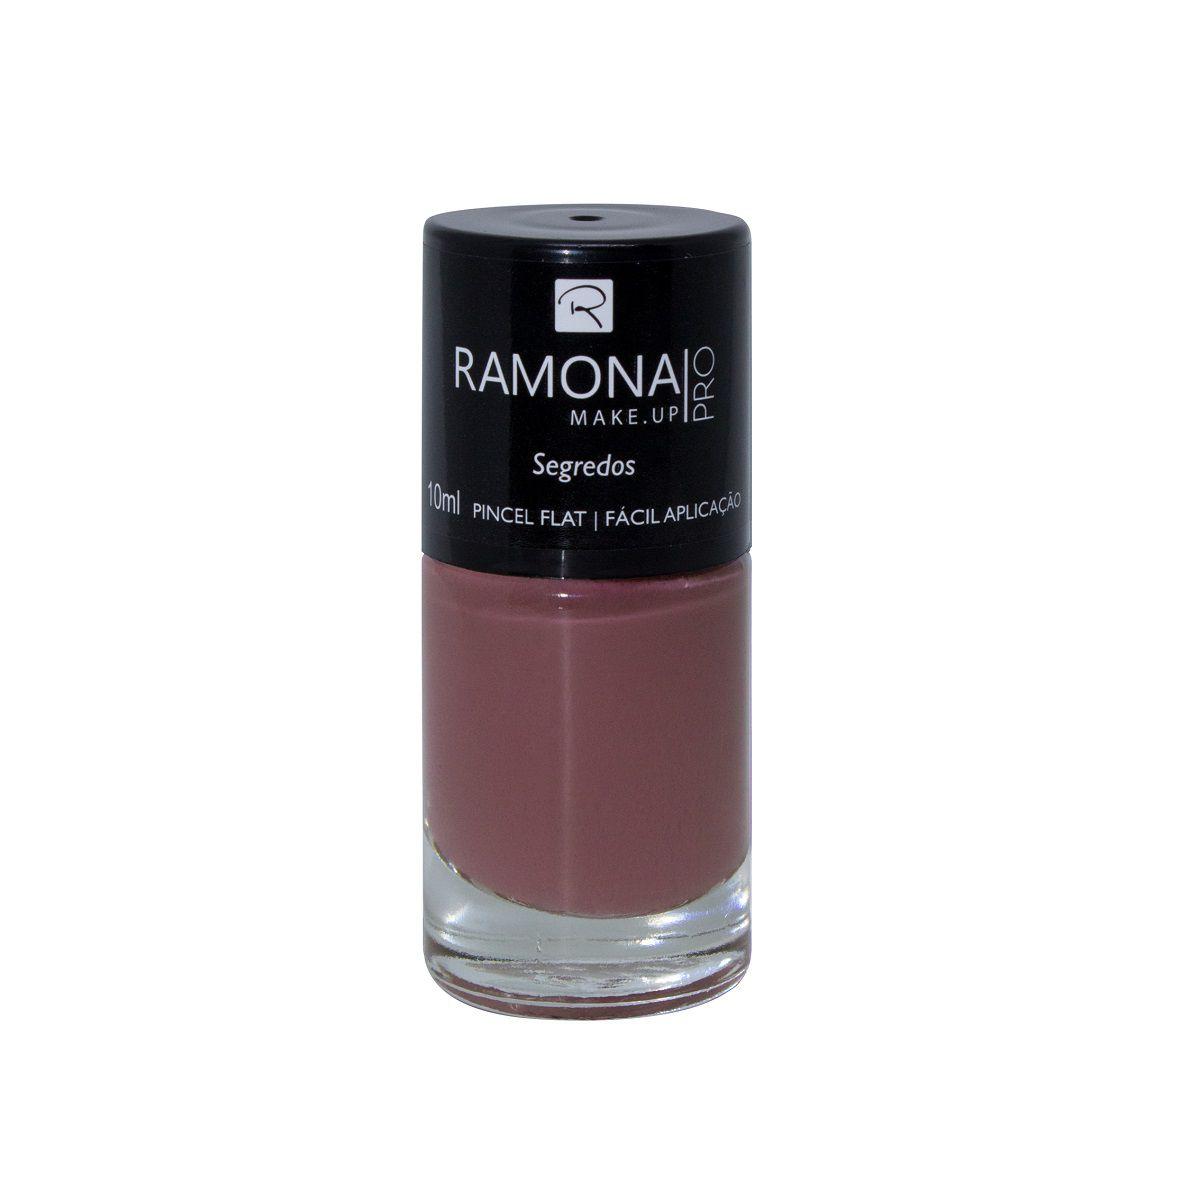 Esmalte cremoso Ramona Cosméticos Segredos 10ml